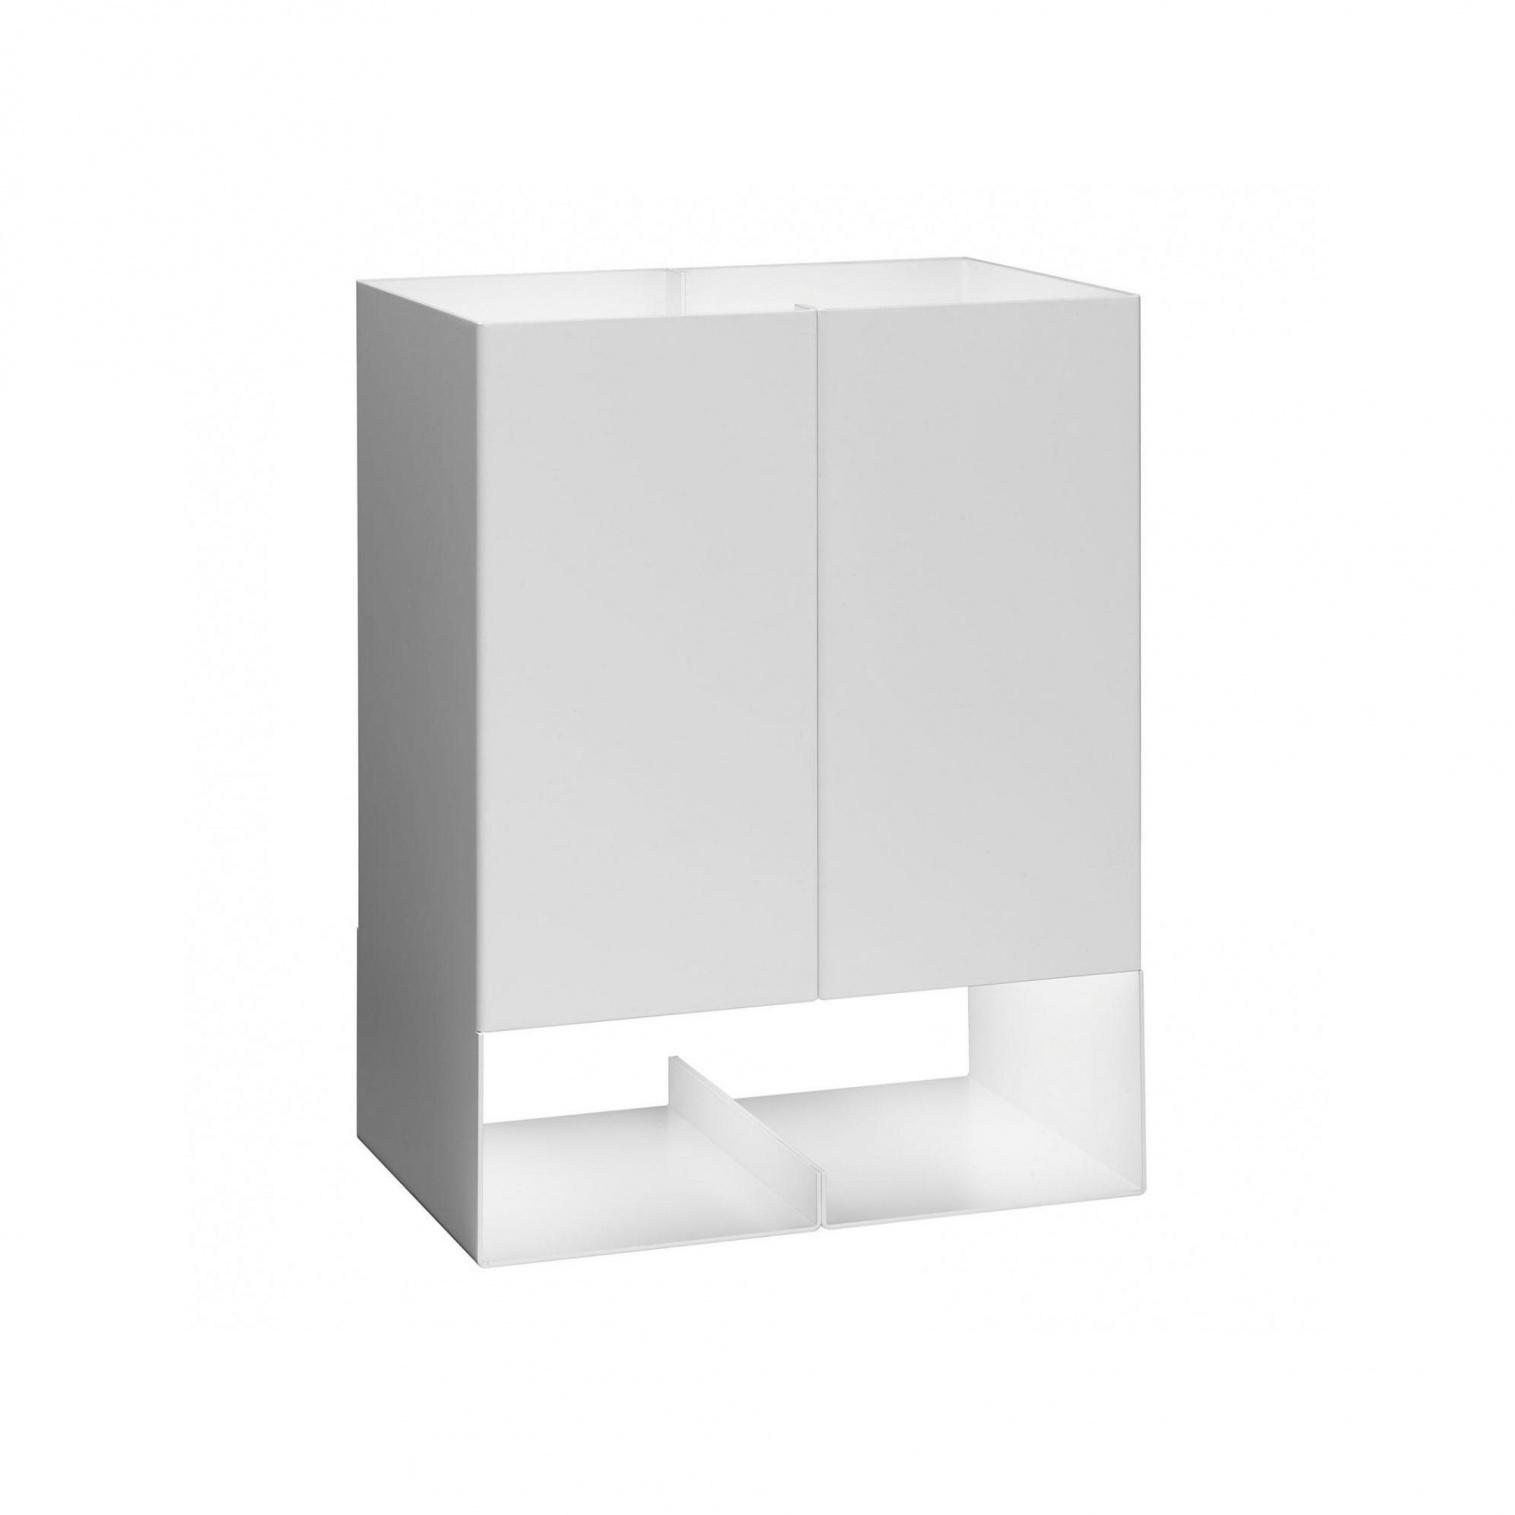 e15 LT02 Seam Two - Lampe de table LED LT02 - blanc